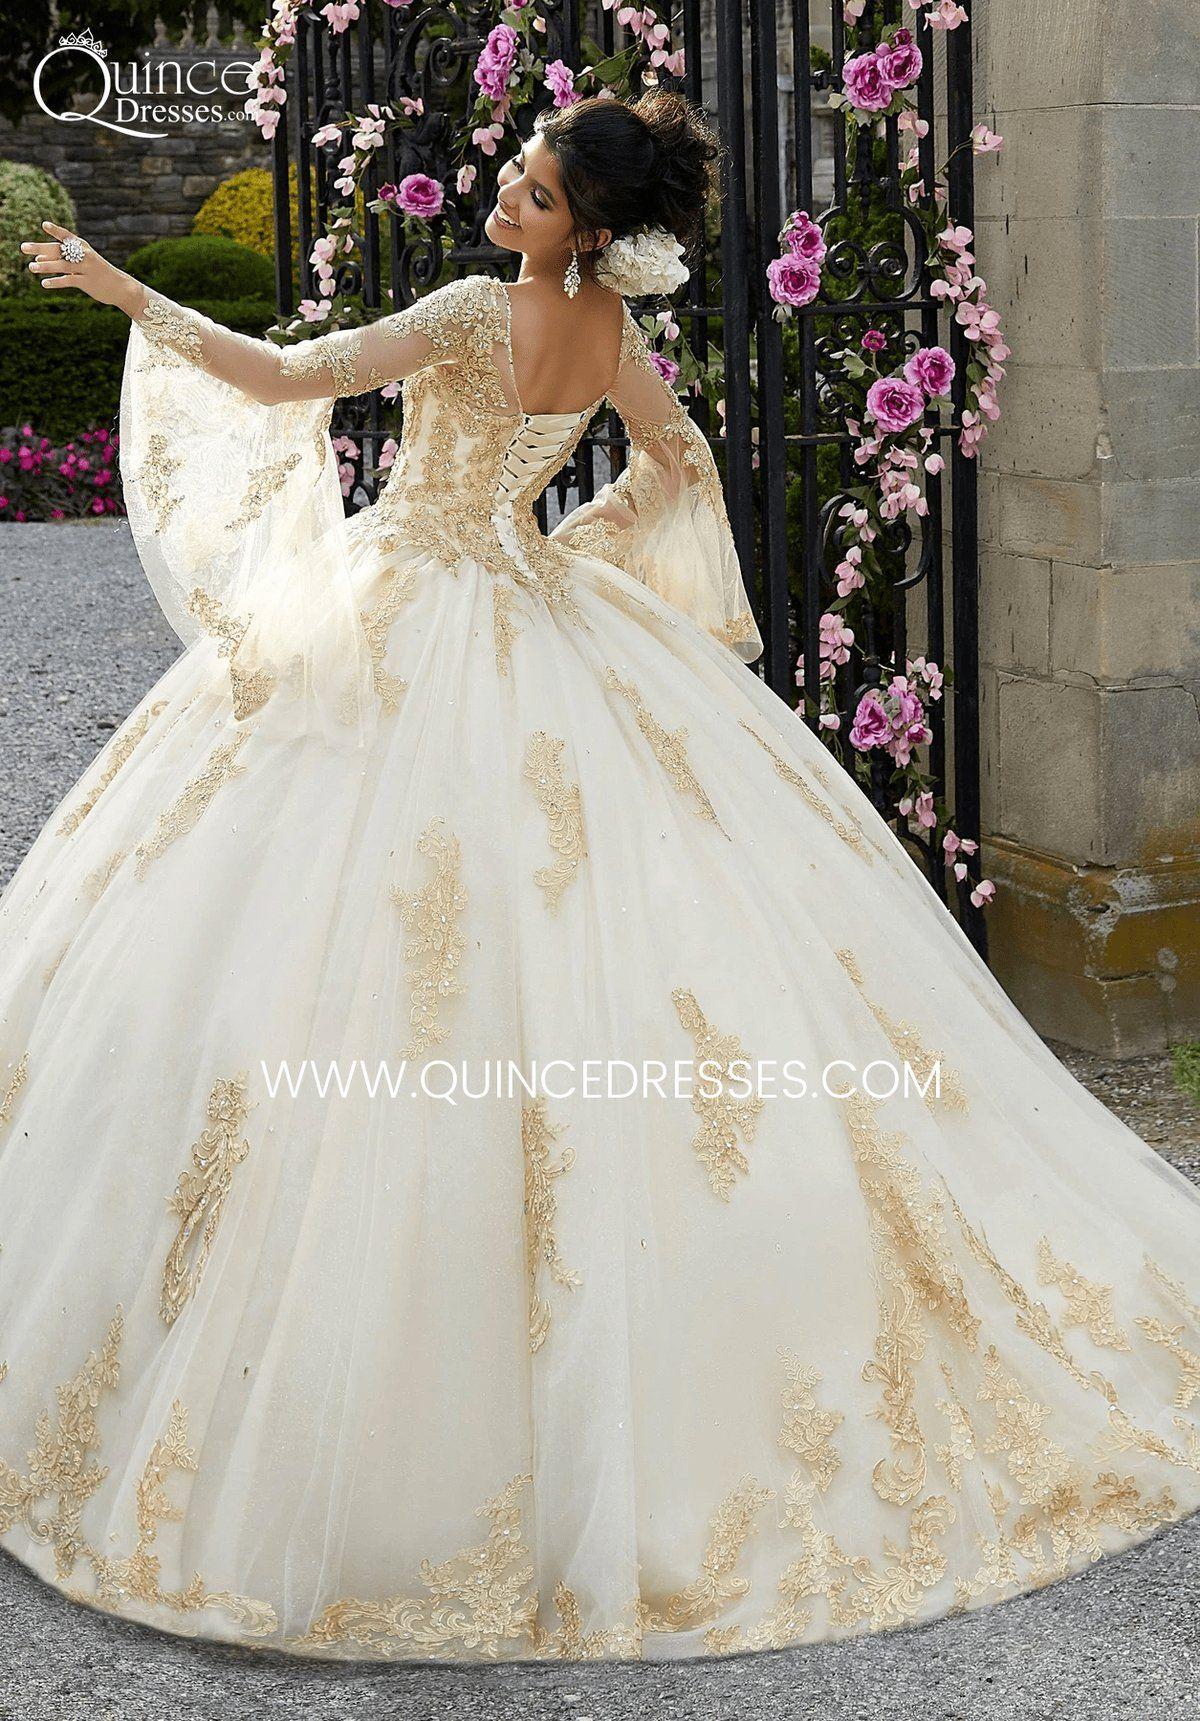 Valentina By Mori Lee 34021 Quinceanera Dress In 2021 Quinceanera Dresses Gold Quinceanera Dresses Ball Gowns Wedding [ 1721 x 1200 Pixel ]